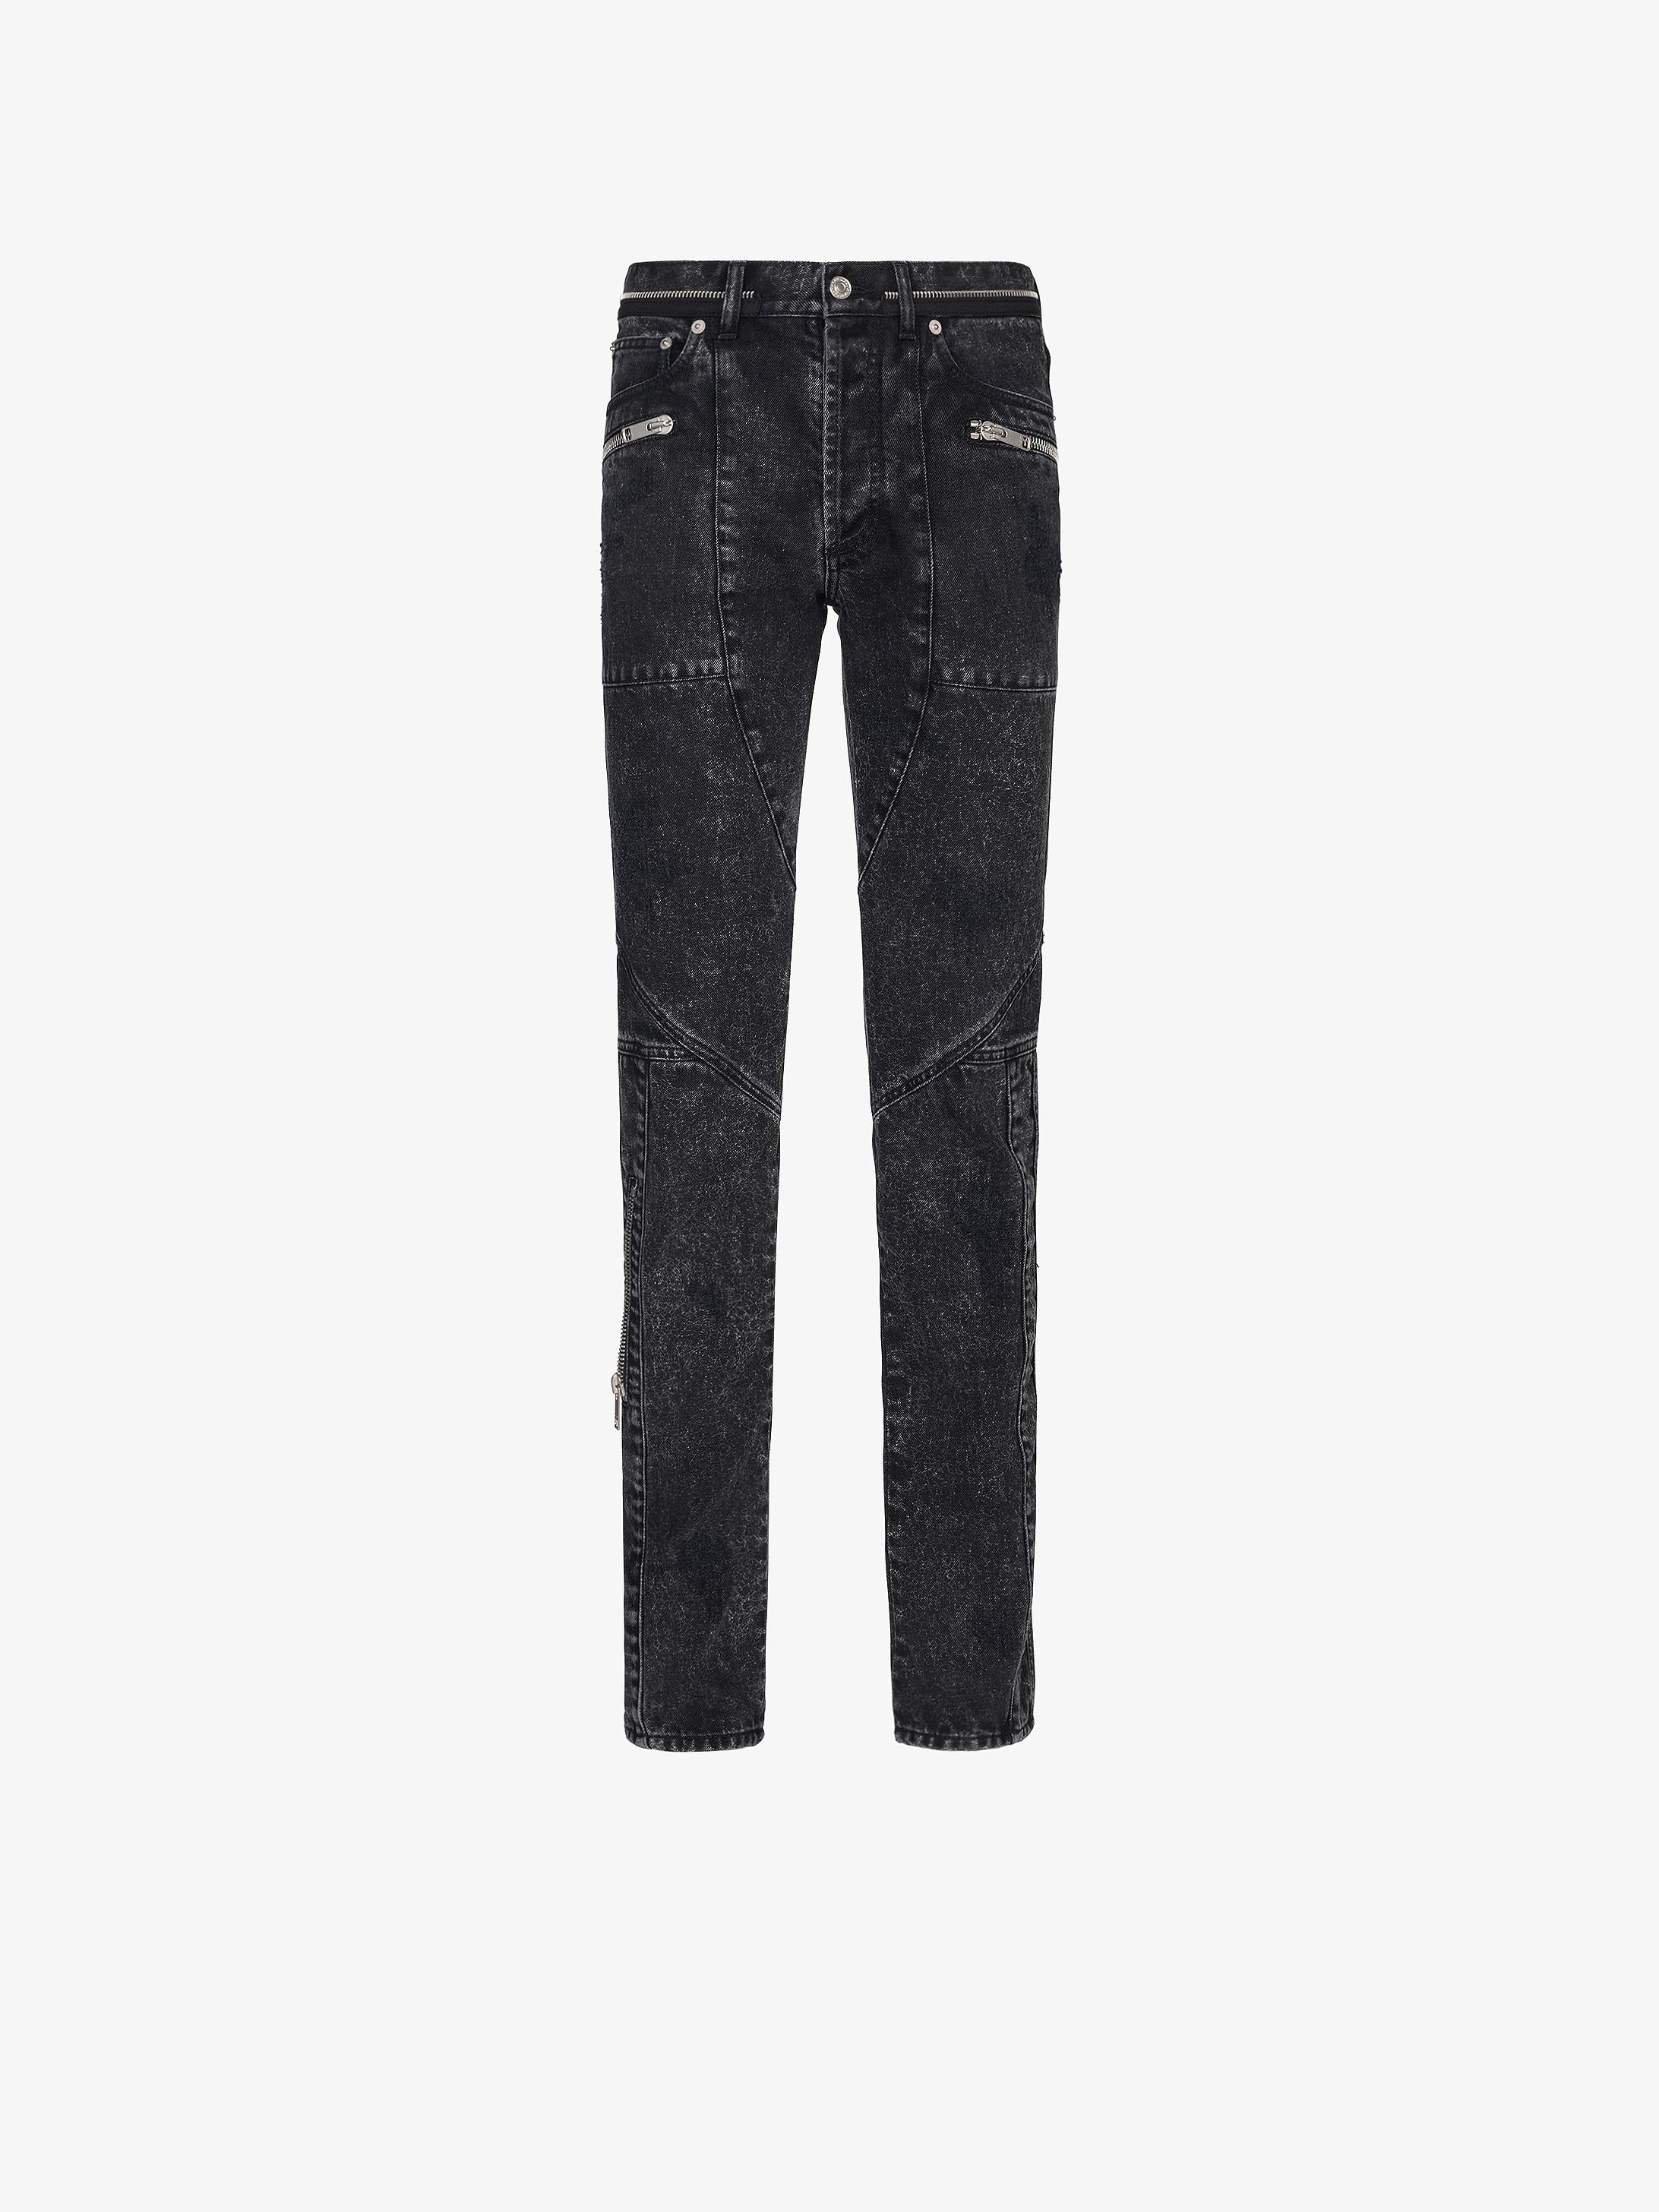 Zipped destroyed biker denim trousers